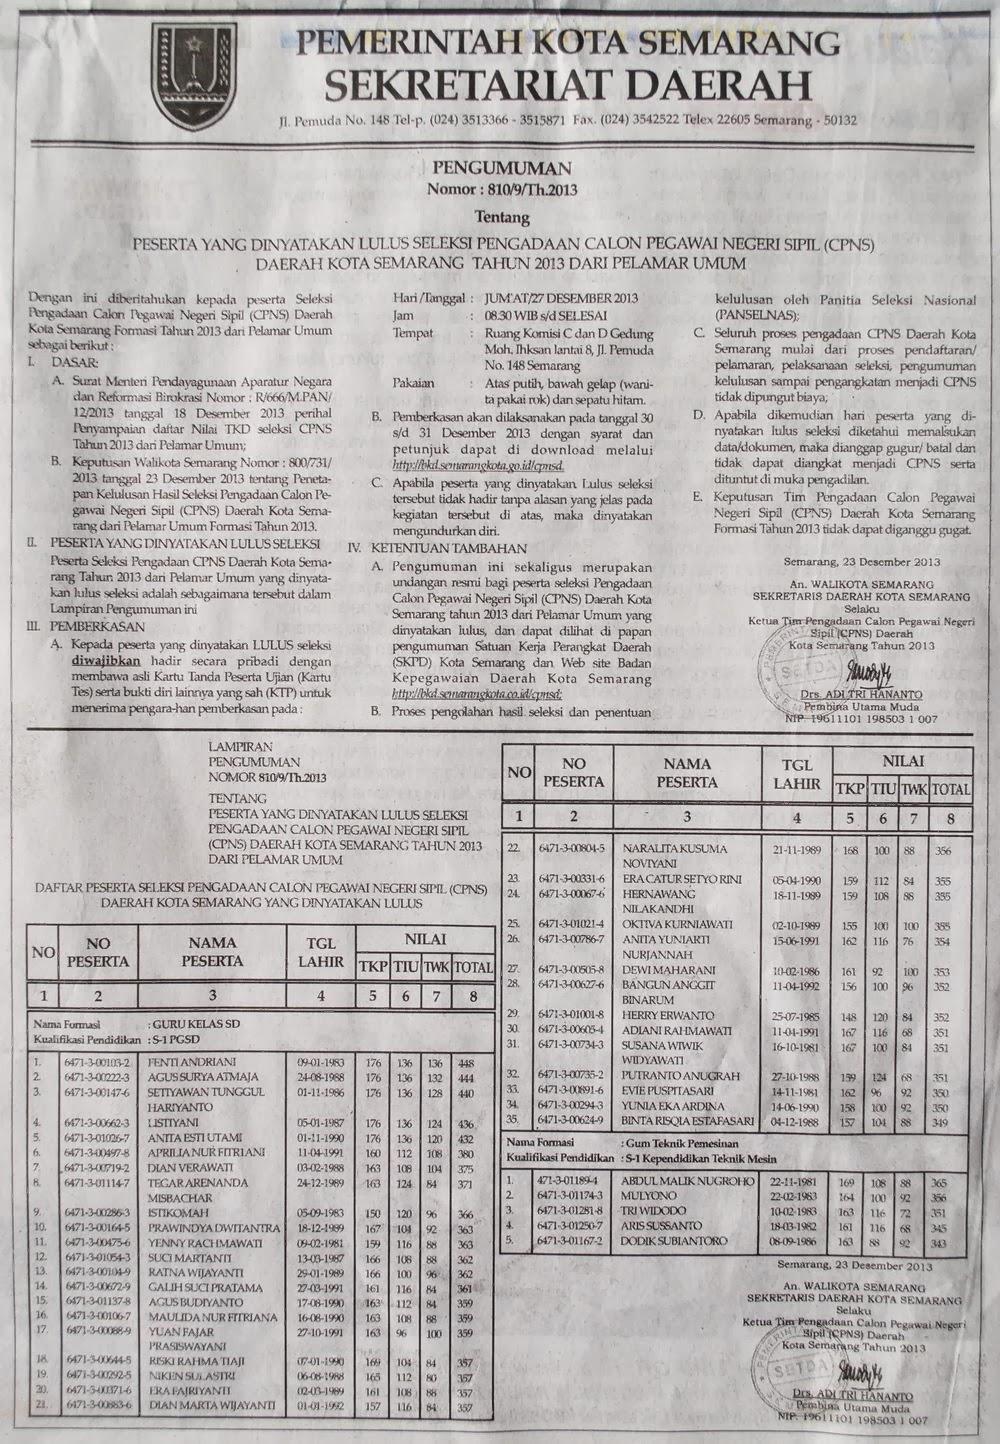 Pendaftaran Cpns Kab Bantaeng Info Lowongan Cpns 2016 Terbaru Honorer K2 Terbaru Agustus Kab Sumbawa Barat Mirror Kab Pasaman Kab Bantaeng Kota Malang